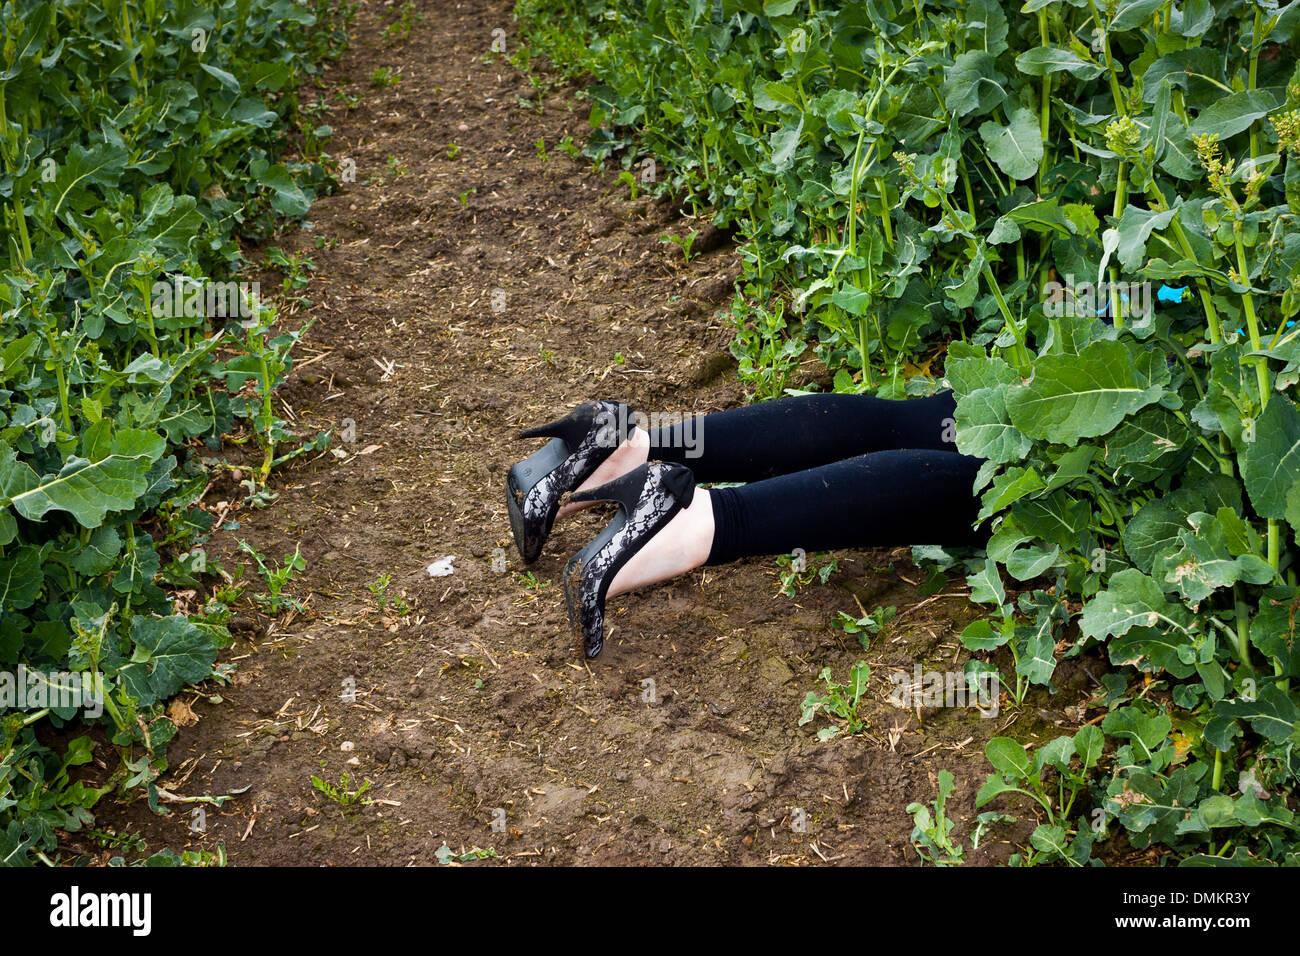 Legs in a field, suggestive of murder - Stock Image